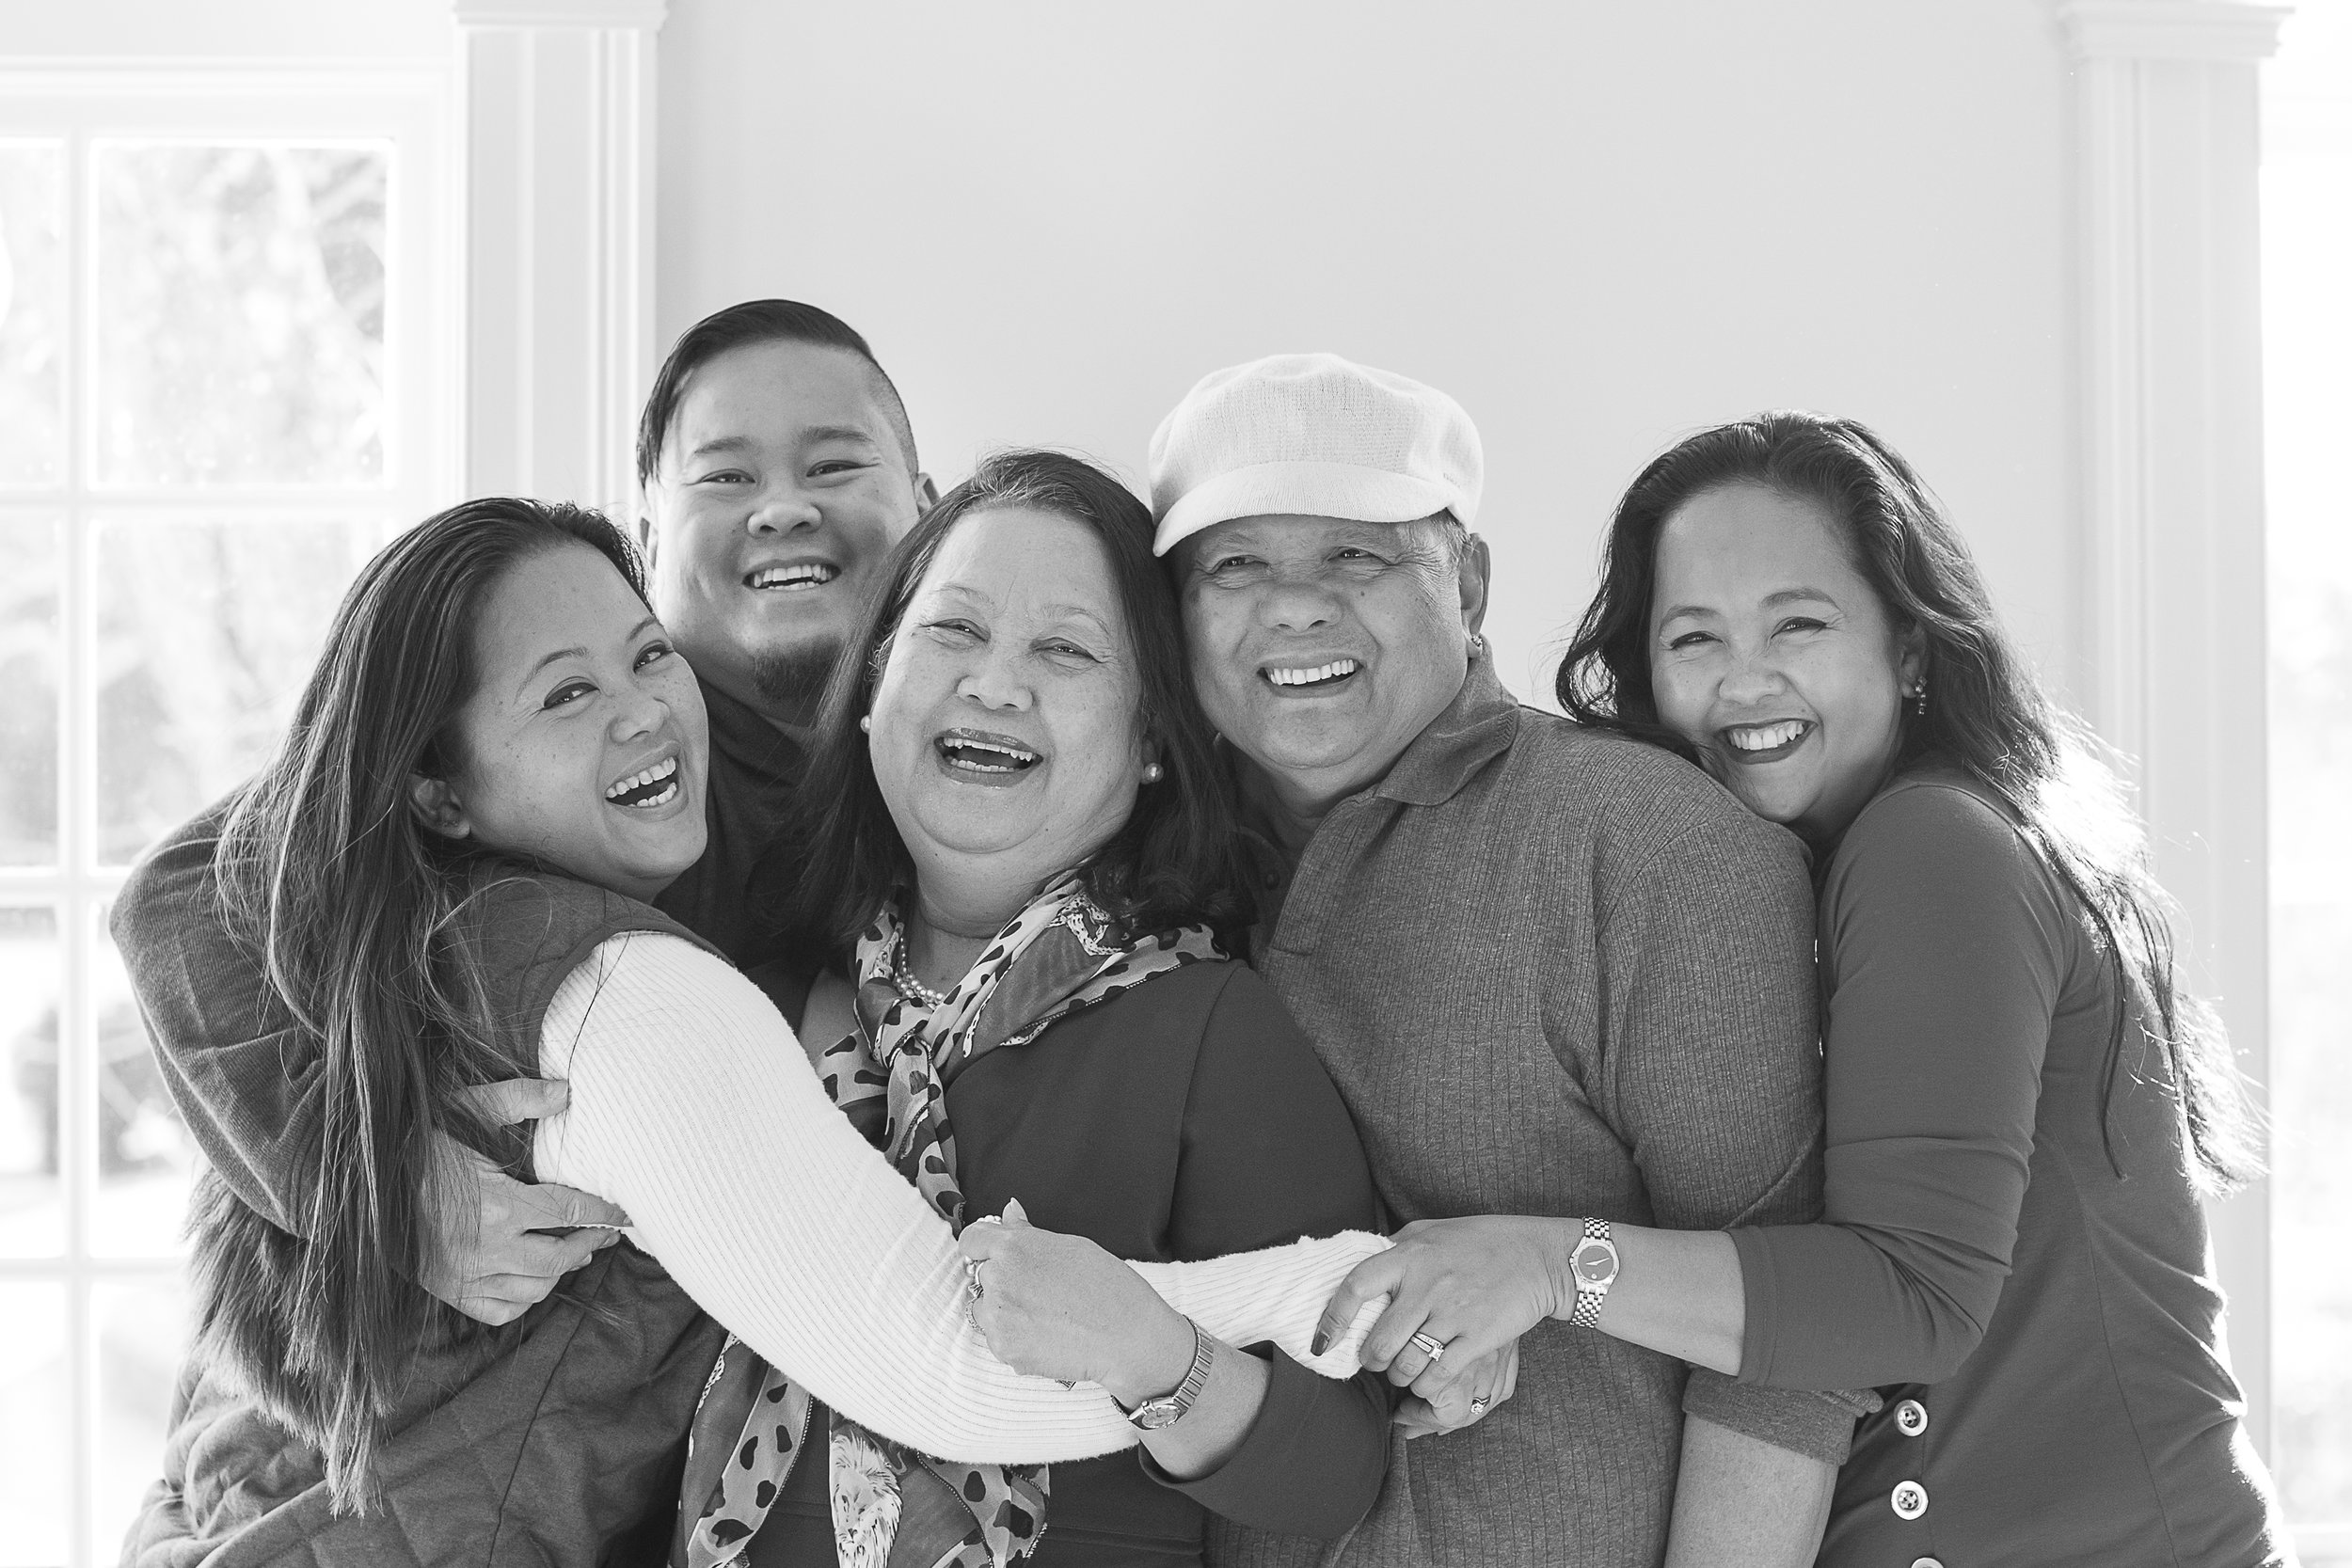 08-JEB-Multi-Family-Portrait-Kim-Pham-Clark-Photography.jpg